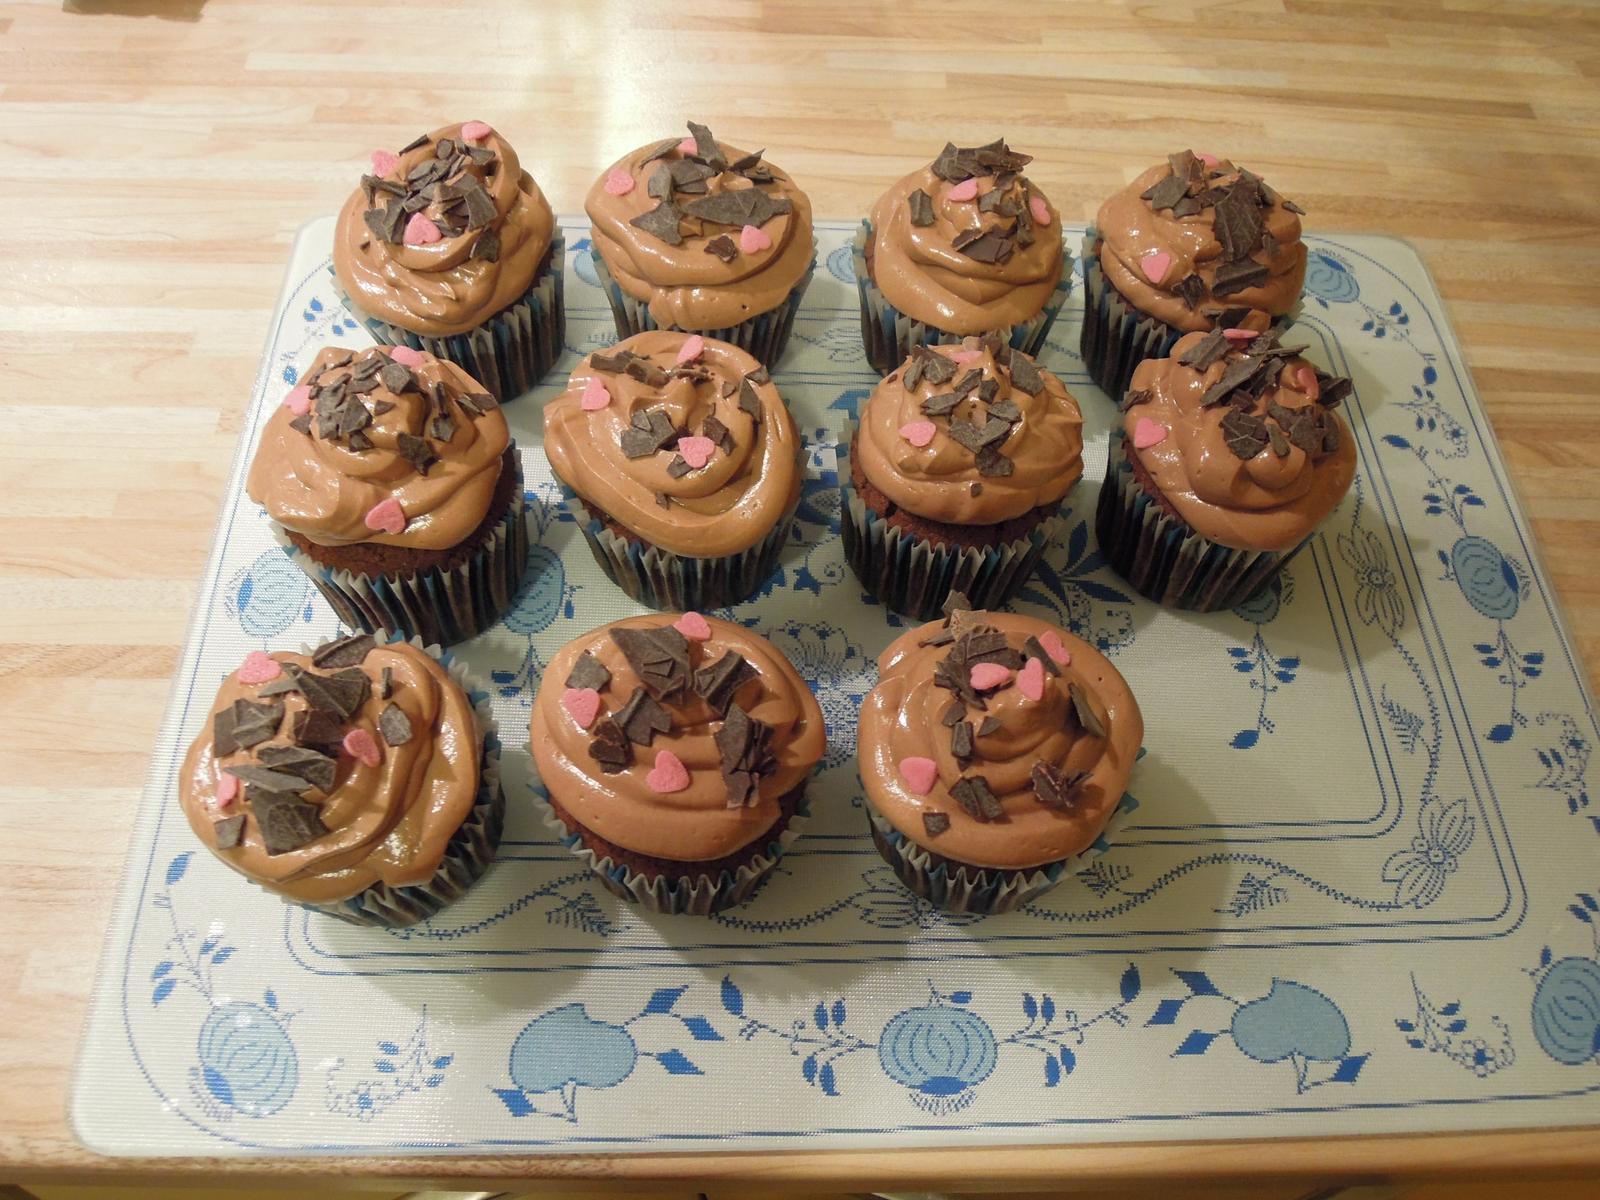 Cupcake´s and Co... moja nova zaluba... - Opat cokoladove cupcakes na ziadost mojho draheho :-)